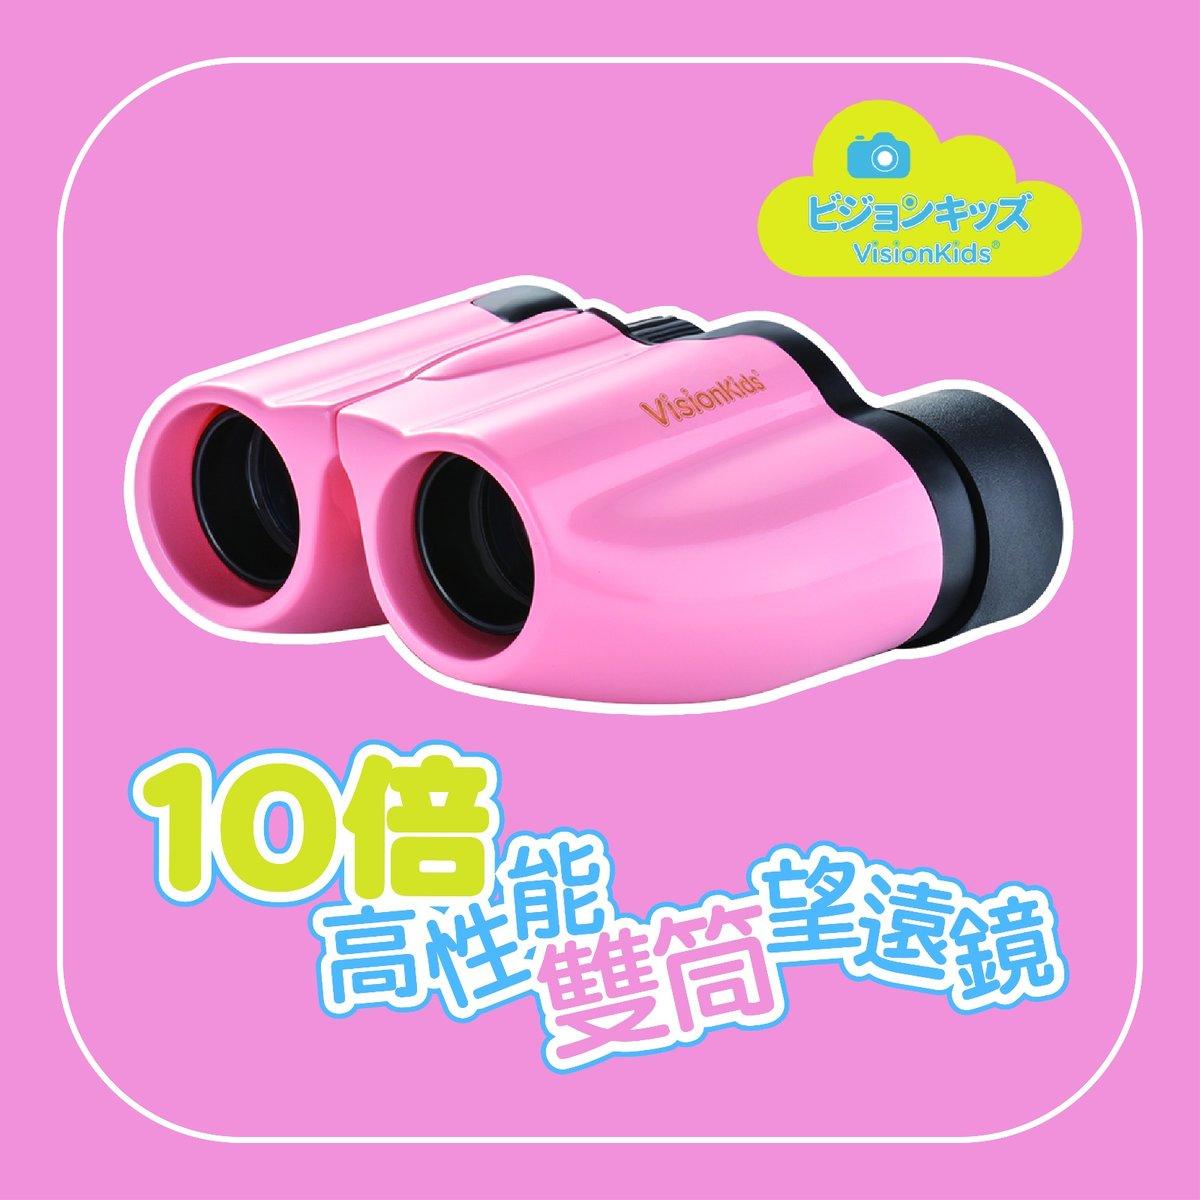 Binoculars 10倍高性能雙筒望遠鏡-粉紅色